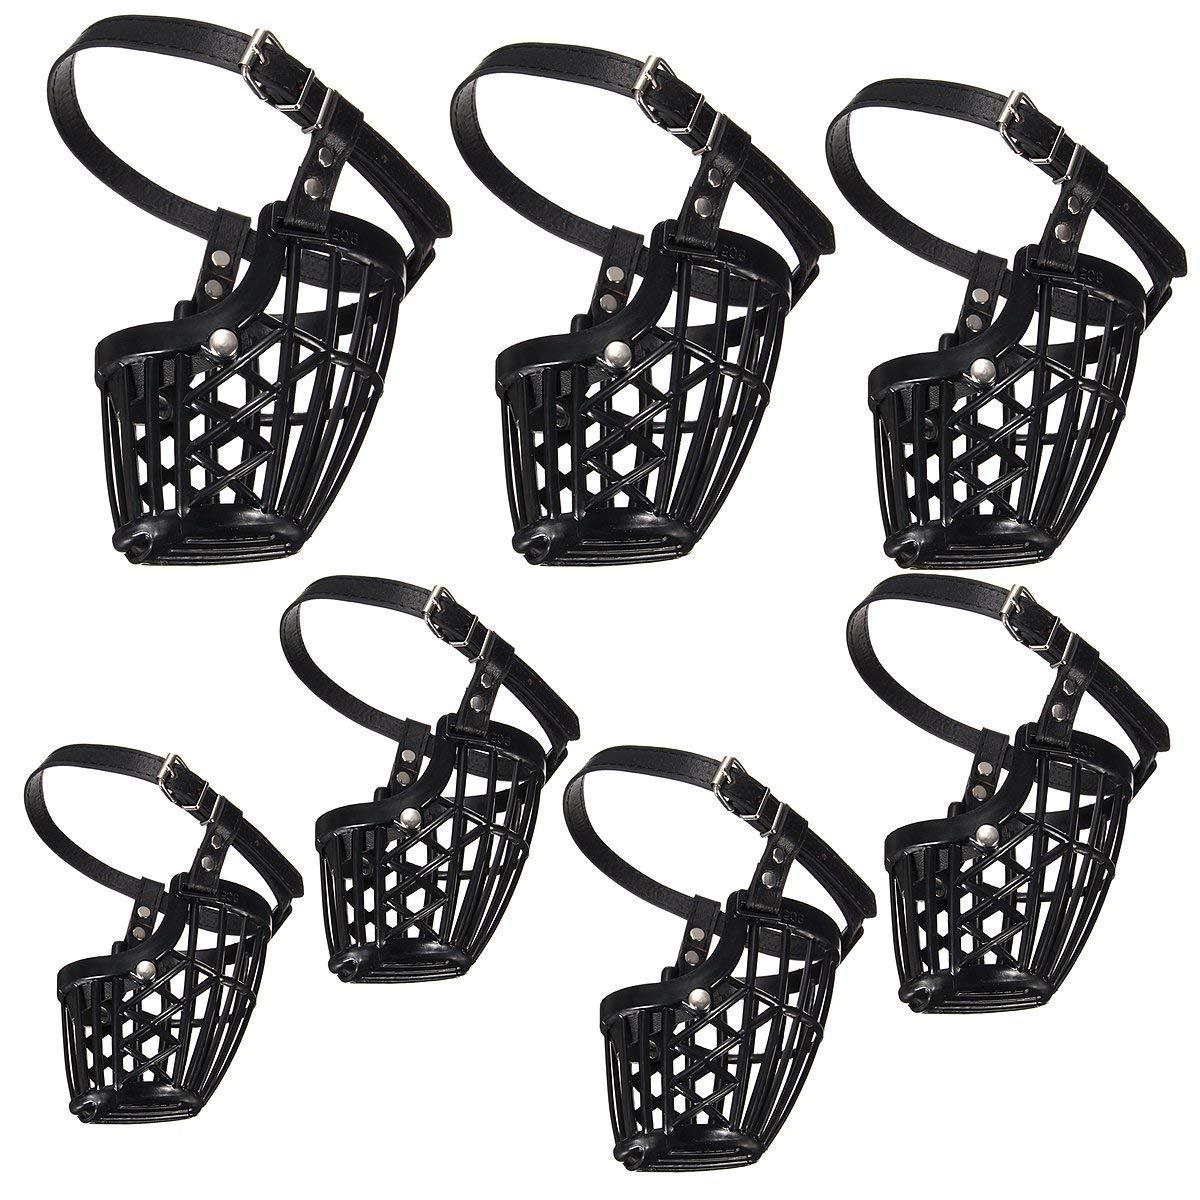 Vivona Hardware & Accessories Adjustable Pet Dog No Bite Plastic Basket Muzzle Cage Mouth Mesh Cover 7 Sizes - (Size: #4)